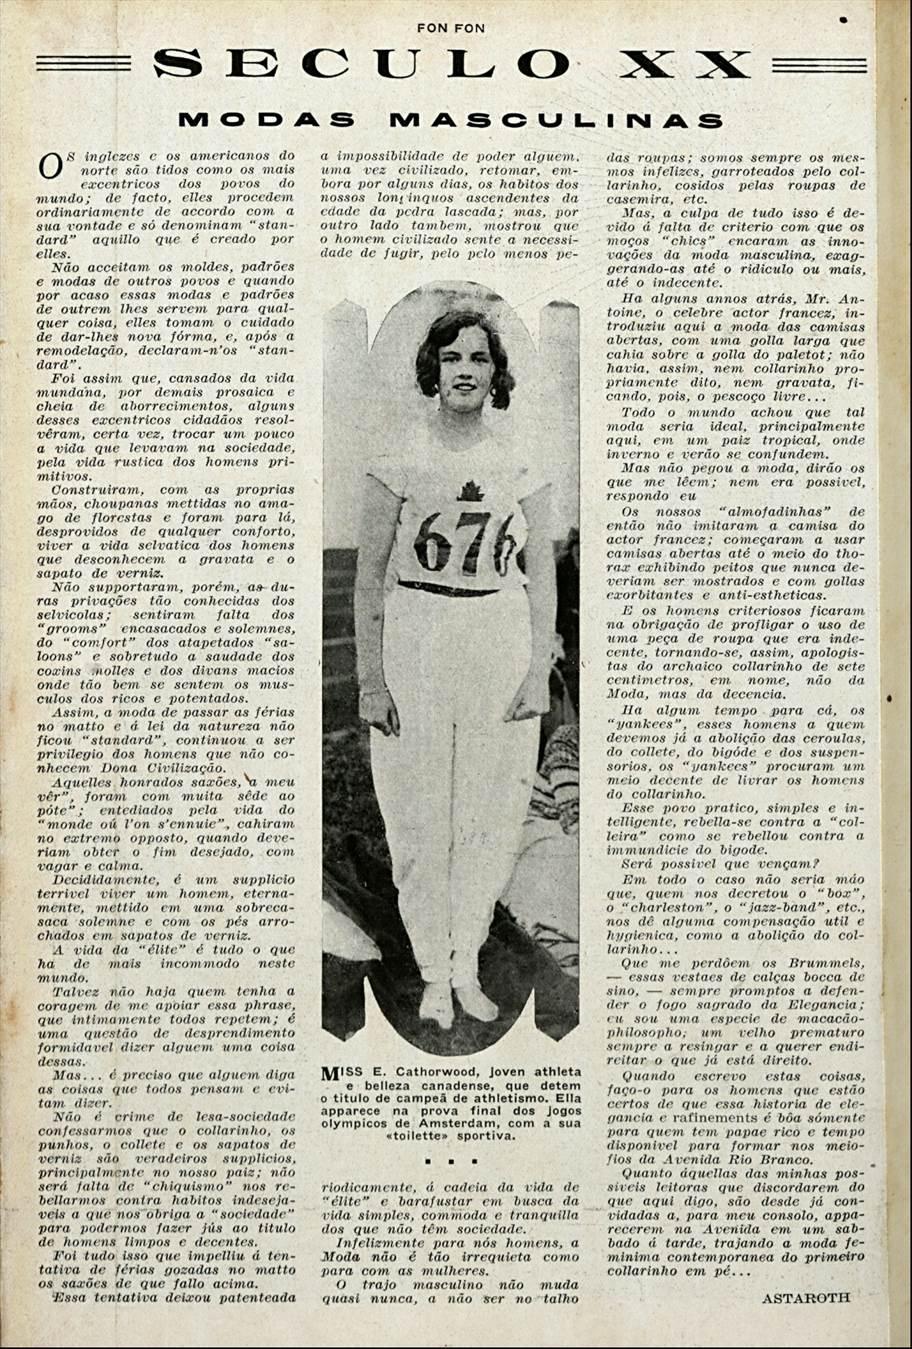 mosa-masc-1928